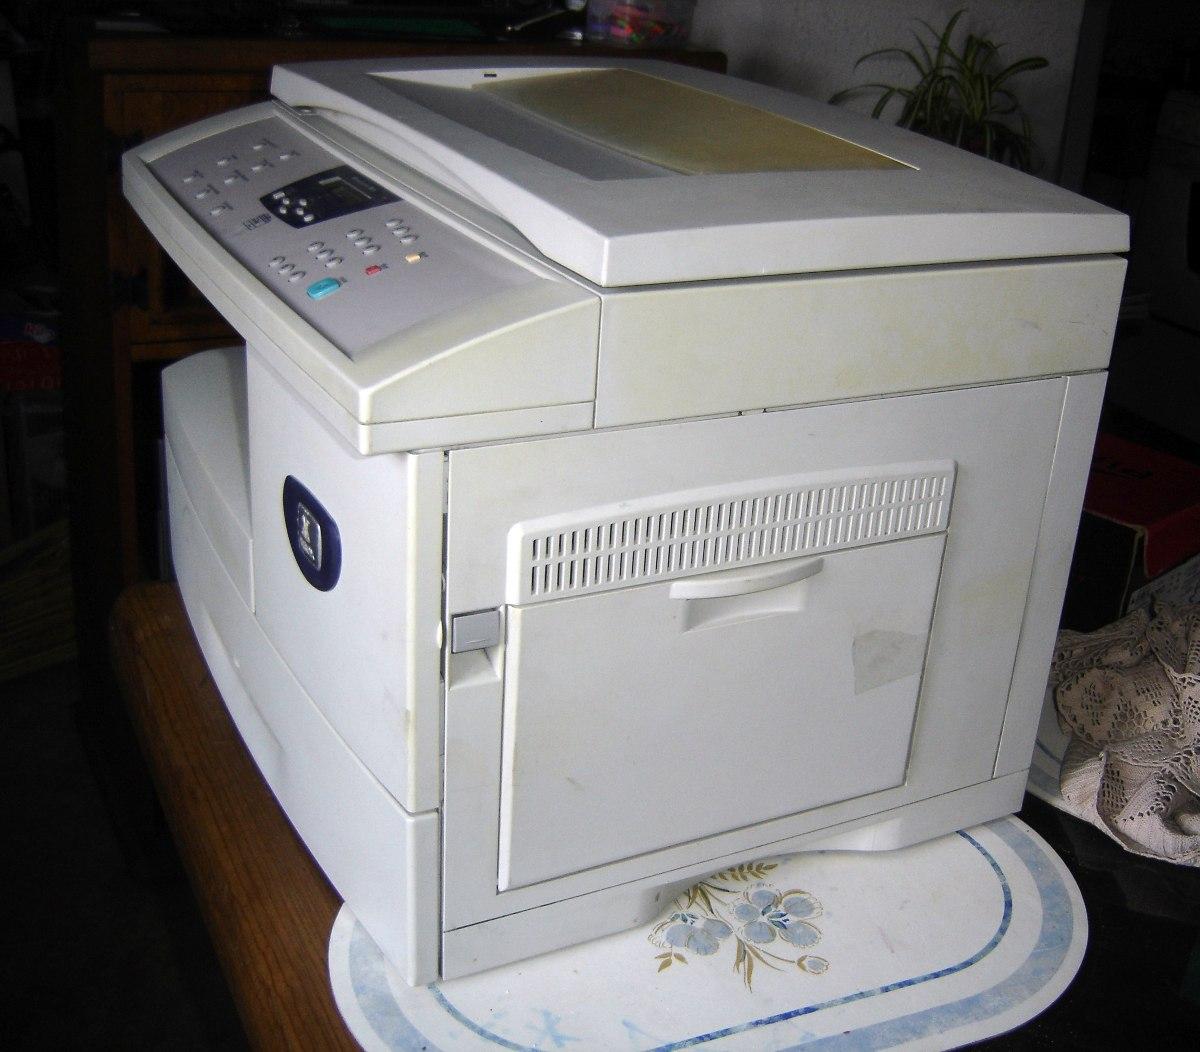 XEROX Printer WorkCentre M15 Treiber